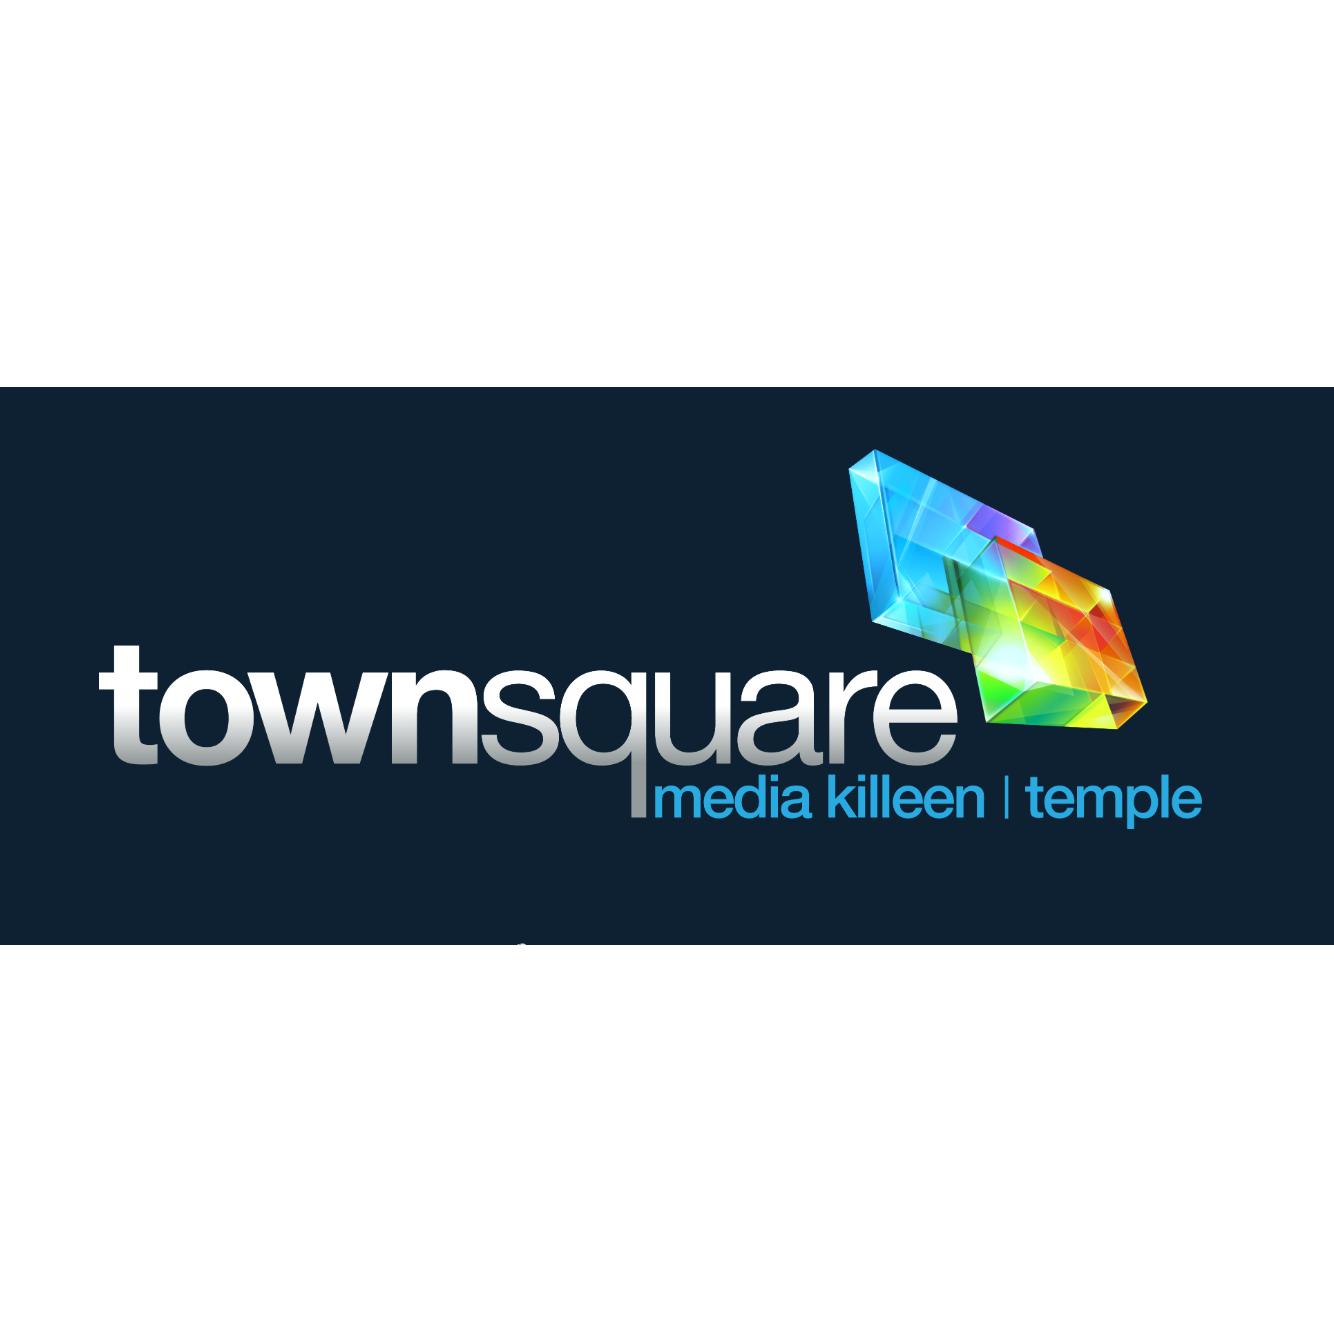 Townsquare Media Killeen/Temple